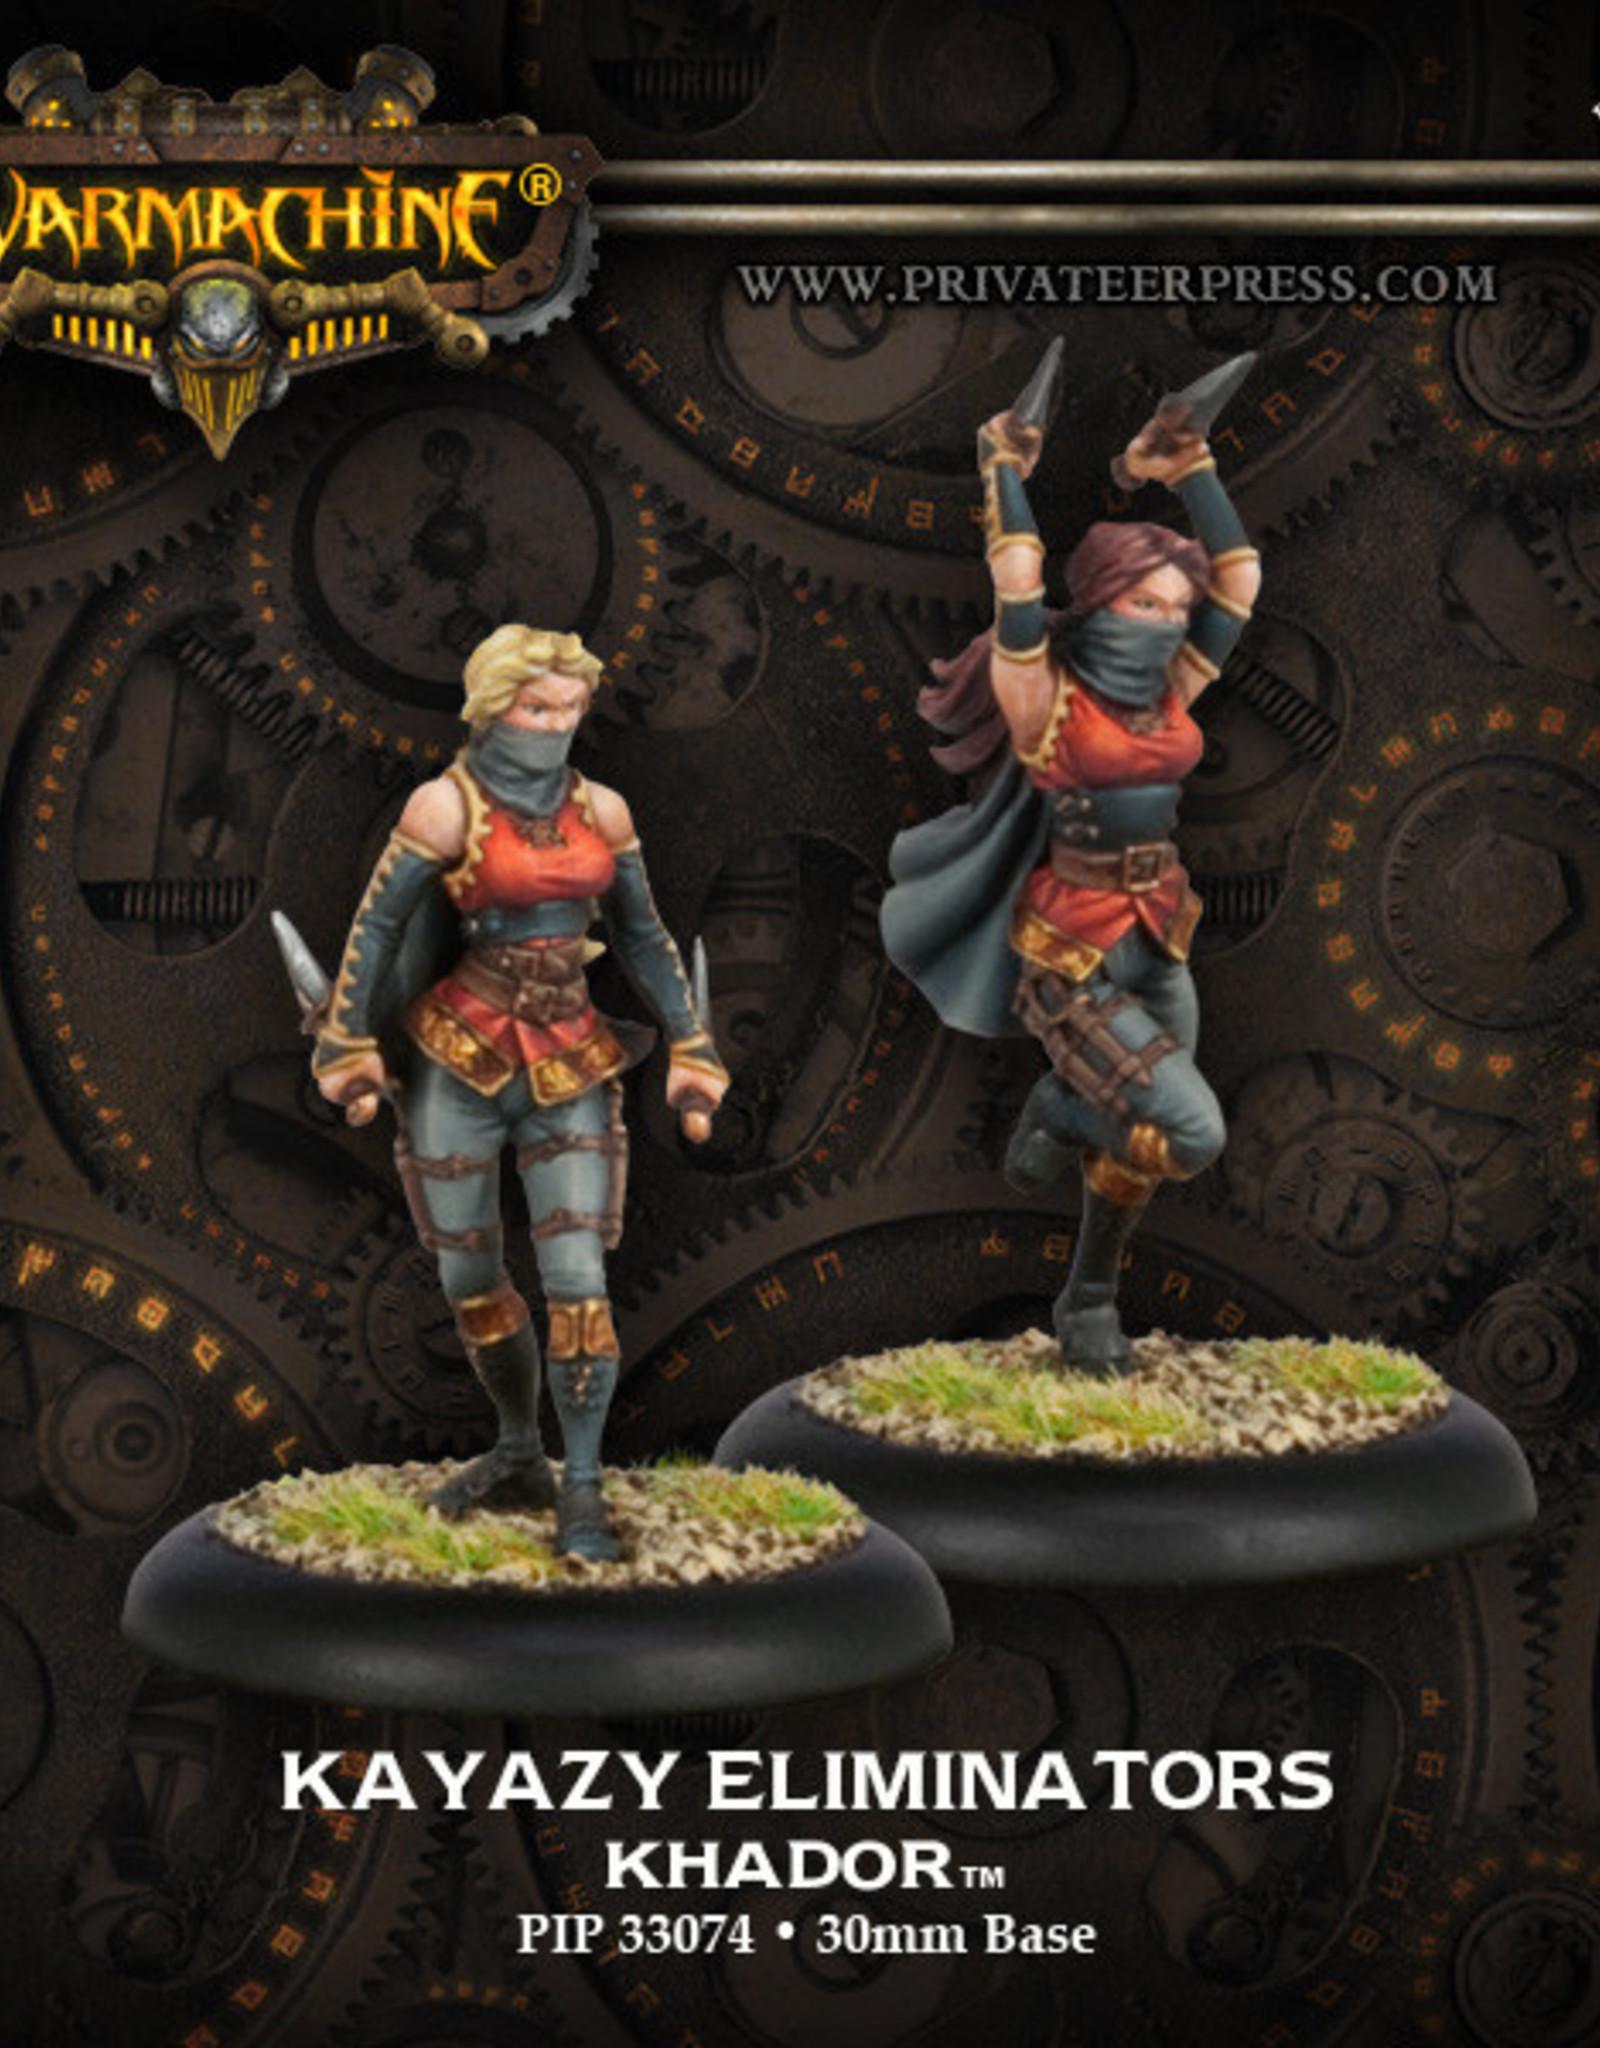 Warmachine Khador - Kayazy Eliminators